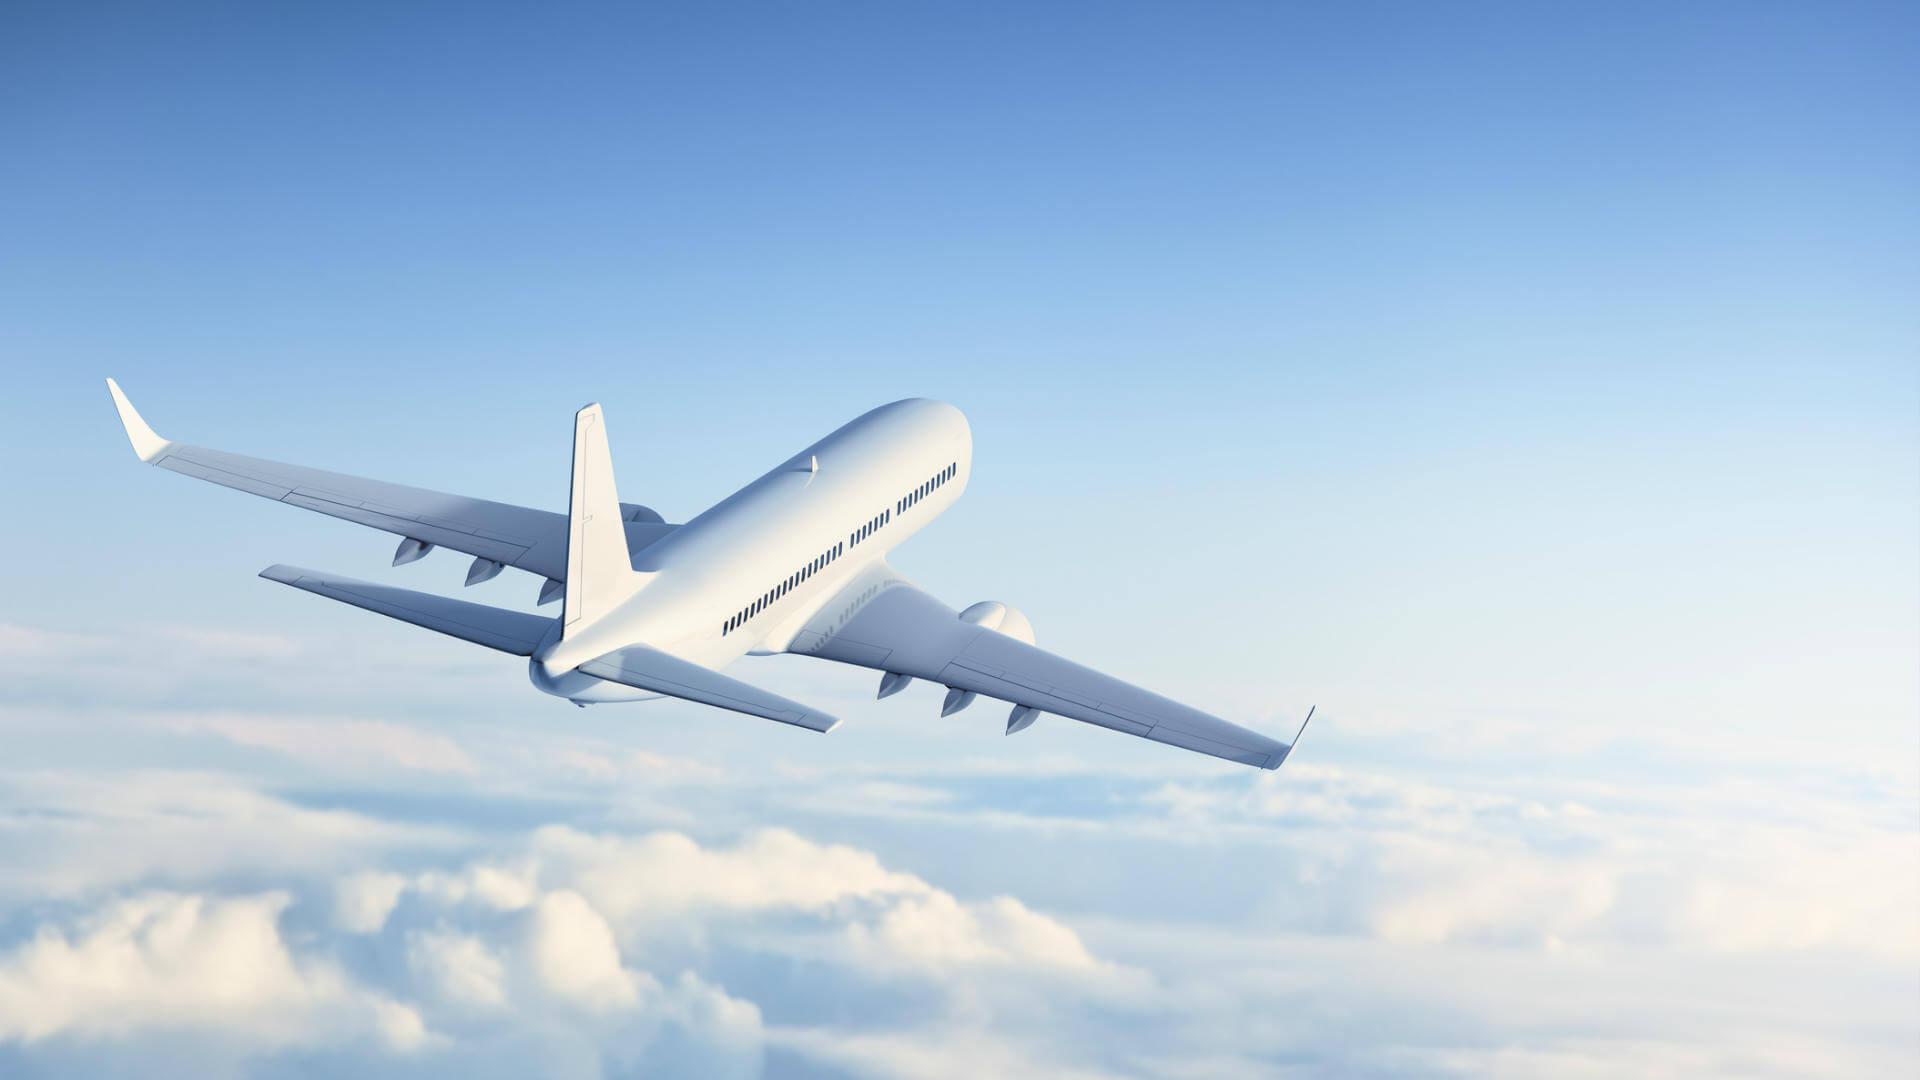 viajes en avion